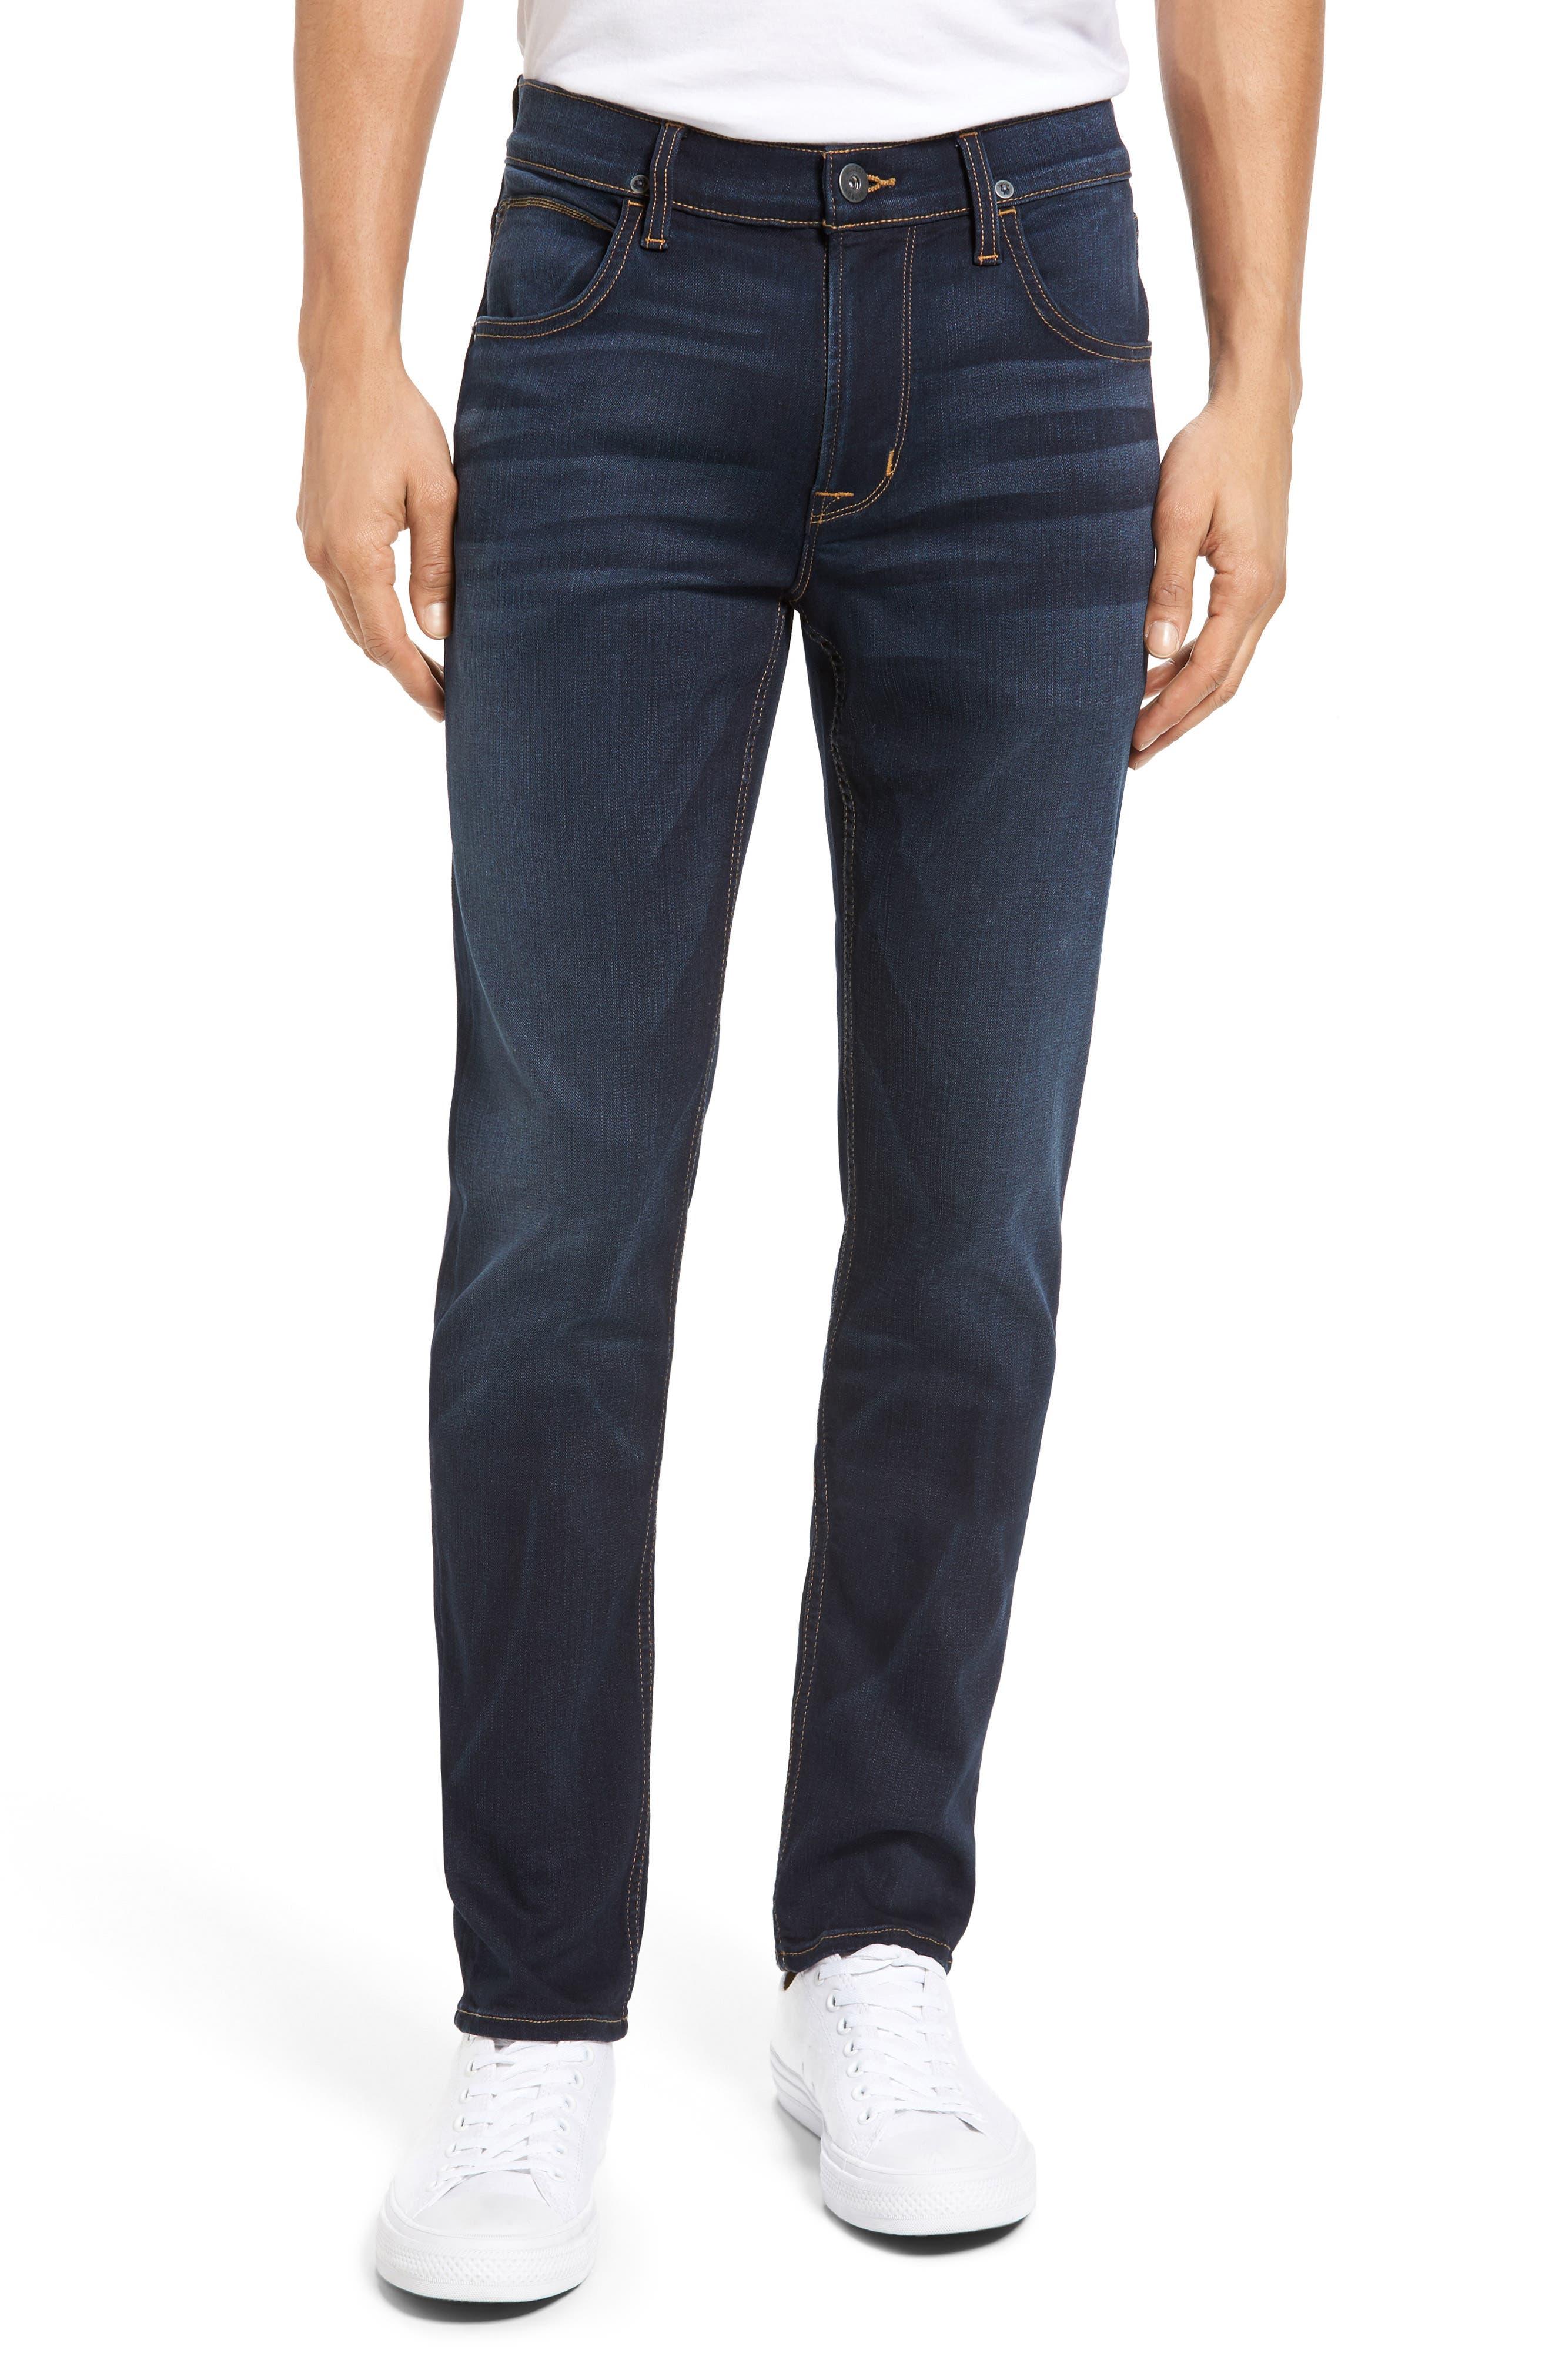 Blake Slim Fit Jeans,                             Main thumbnail 3, color,